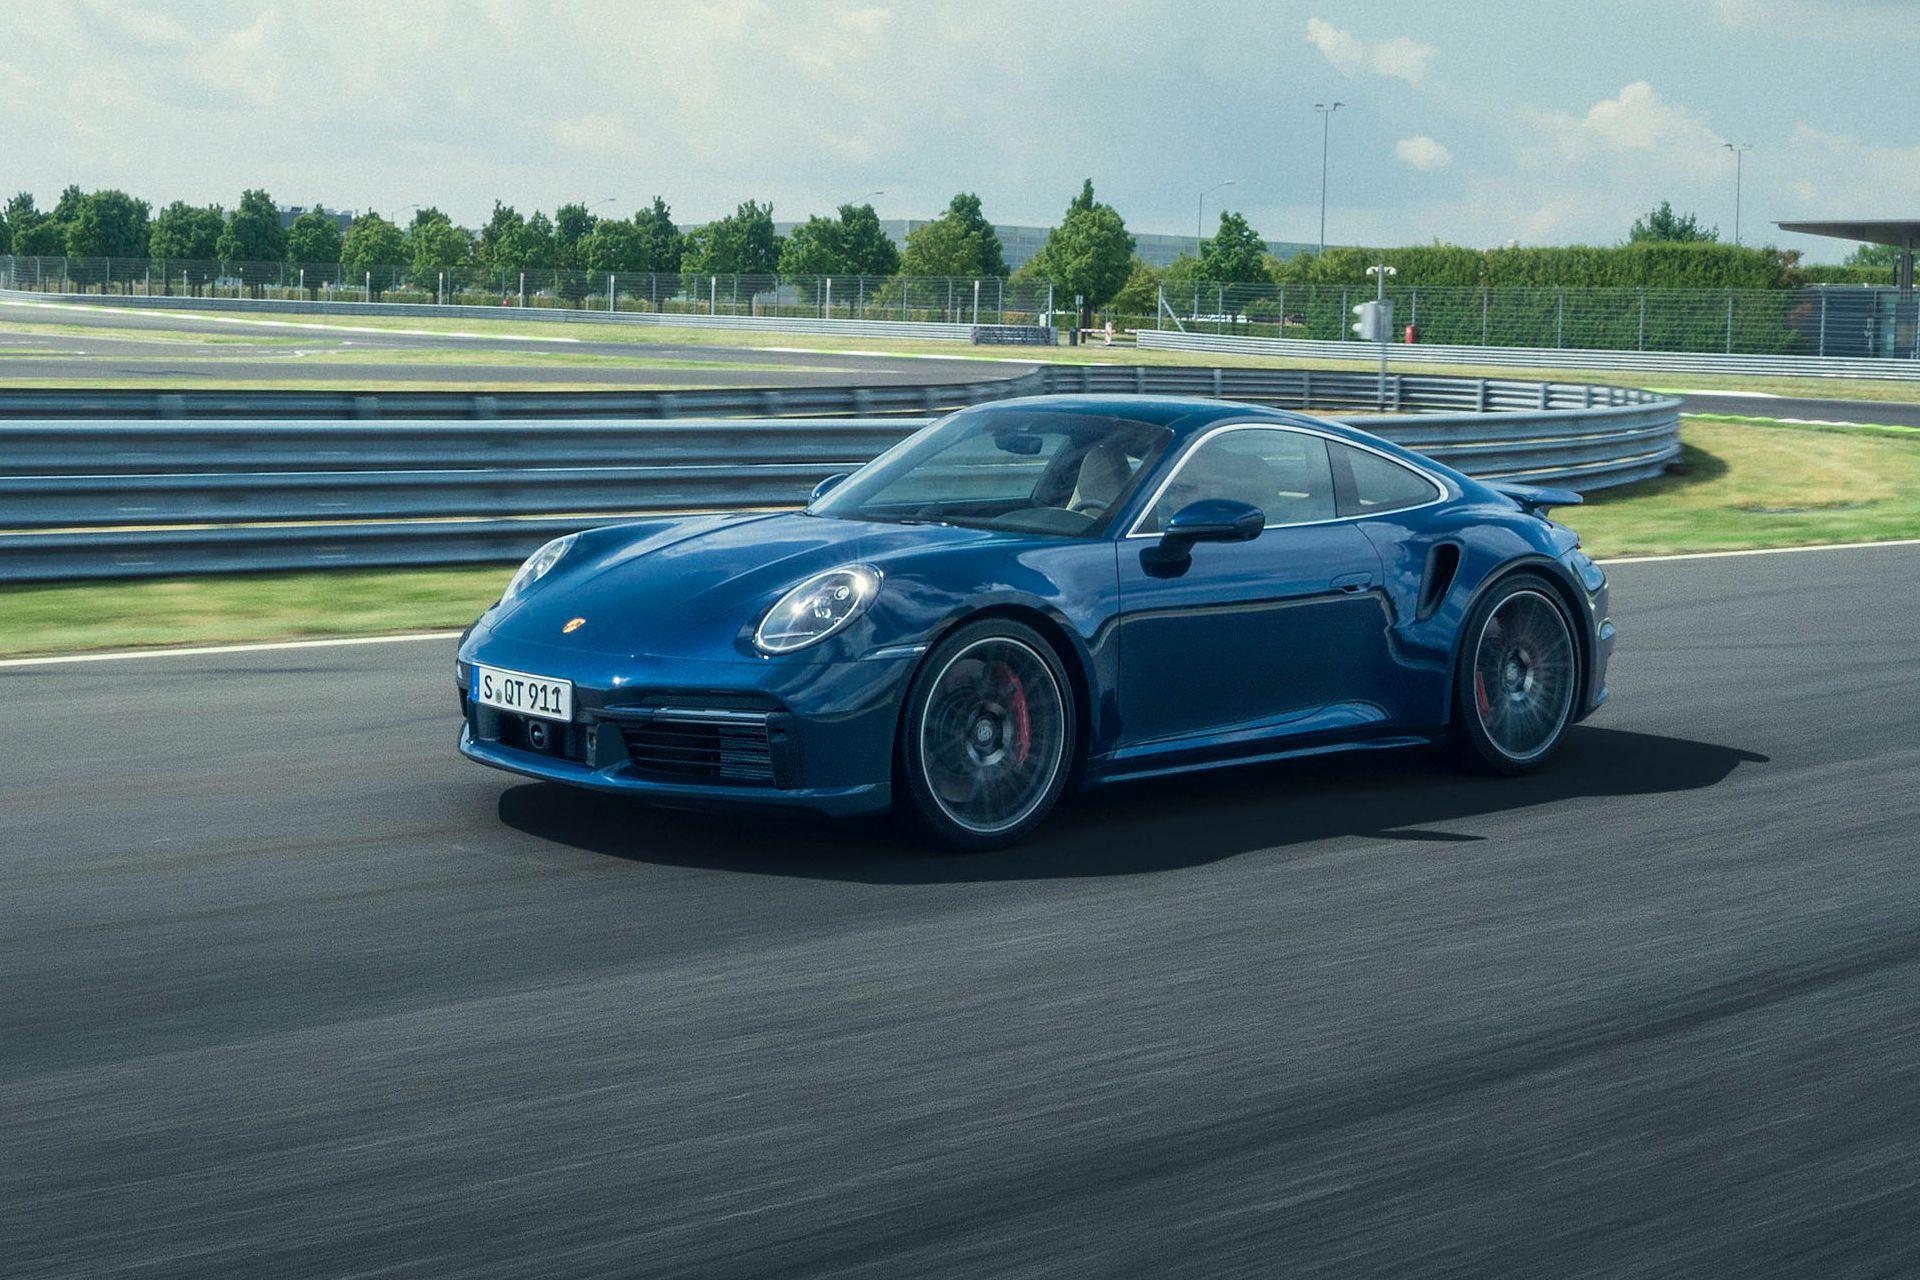 2021-Porsche-911-Turbo-11